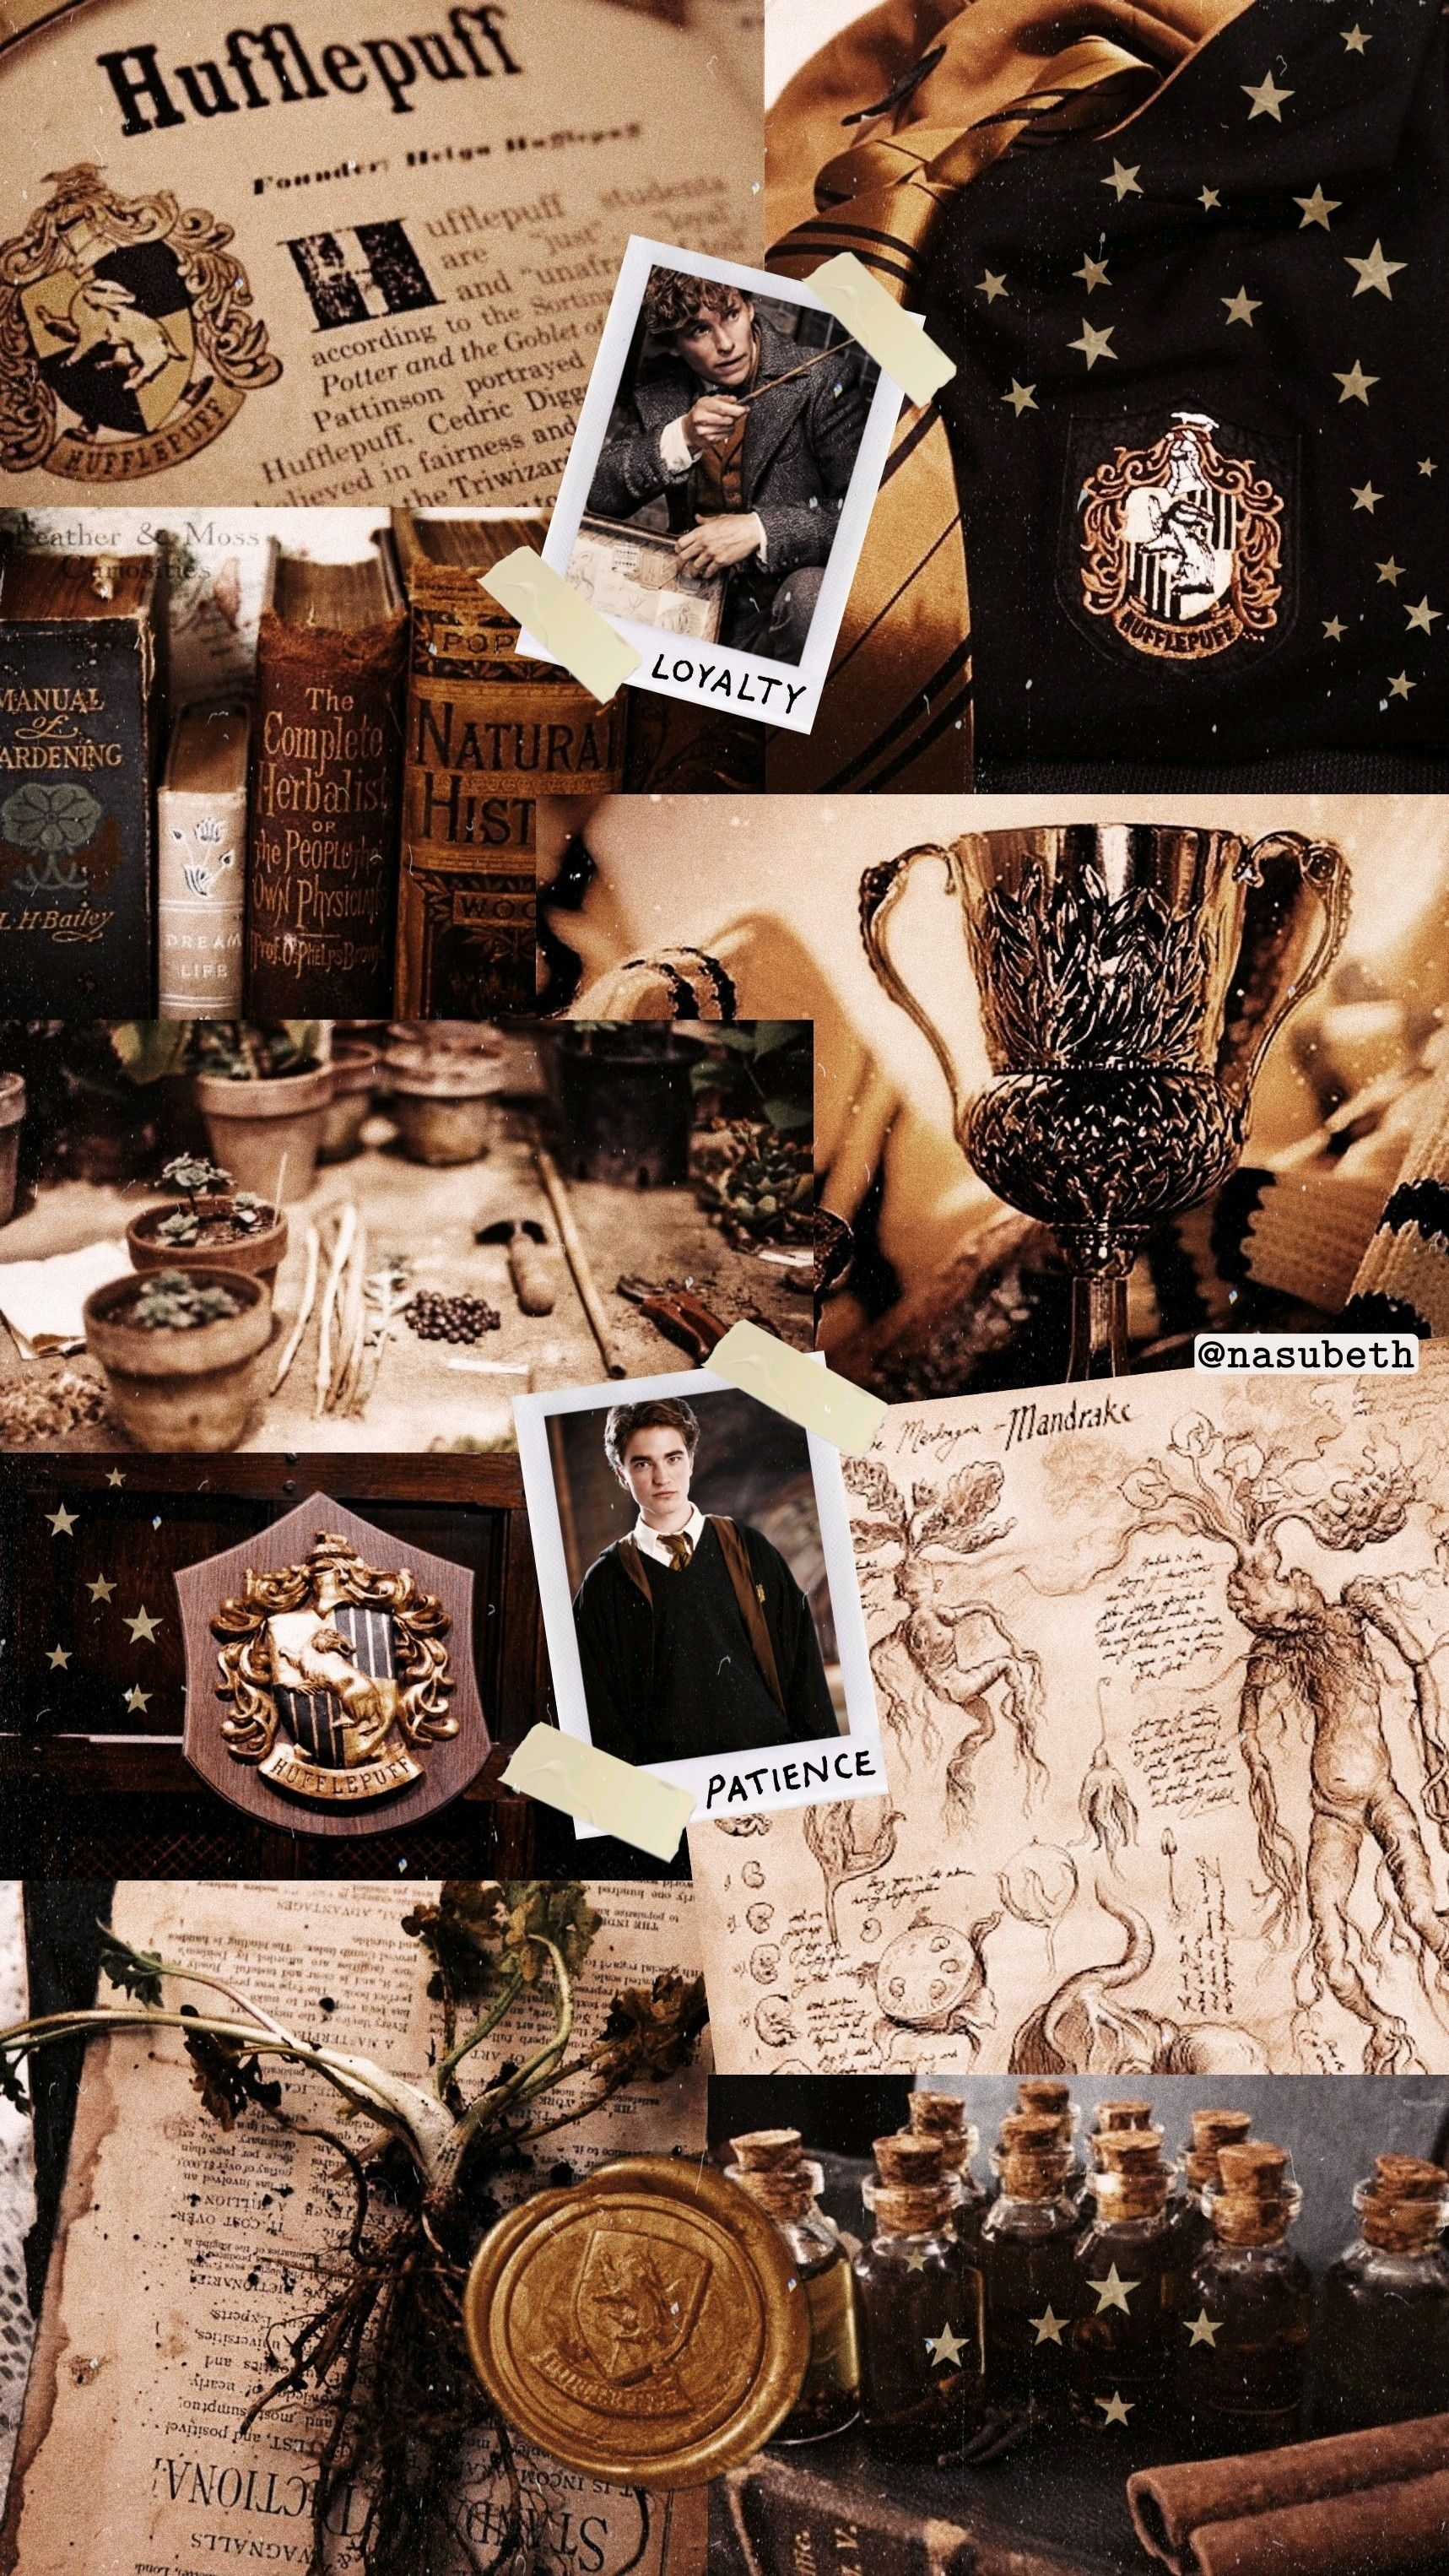 Hogwarts Hogwartsismyhome Hogwartshouses Hogwartsexpress Jkrowling Harrypotter Harryp Harry Potter Images Harry Potter Background Harry Potter Wallpaper